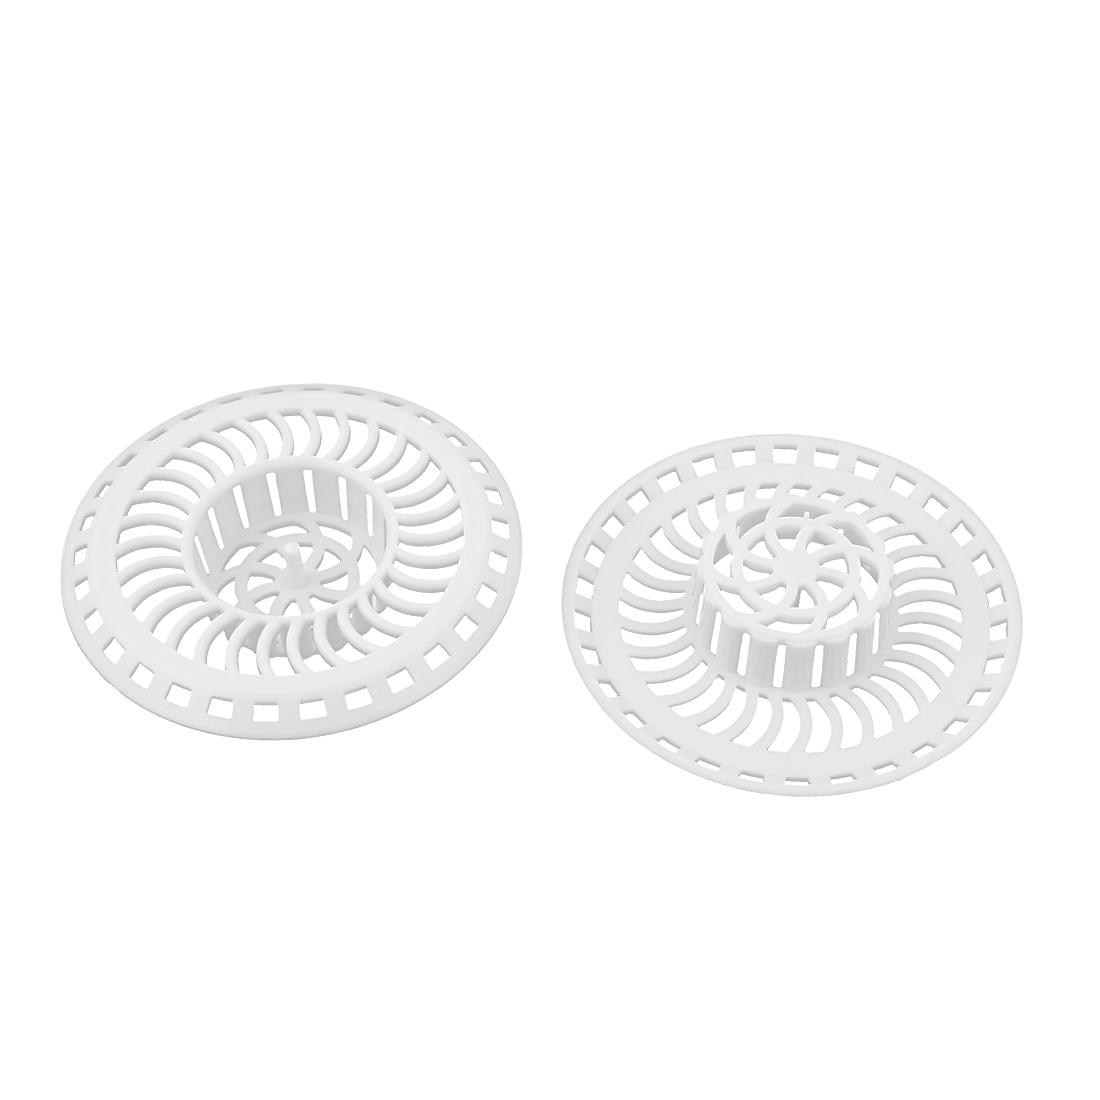 Kitchen Bathroom Plastic Mesh Hole Design Sink Strainer Stopper Basket Drain Bathtub Net Prevent Clogs 2pcs